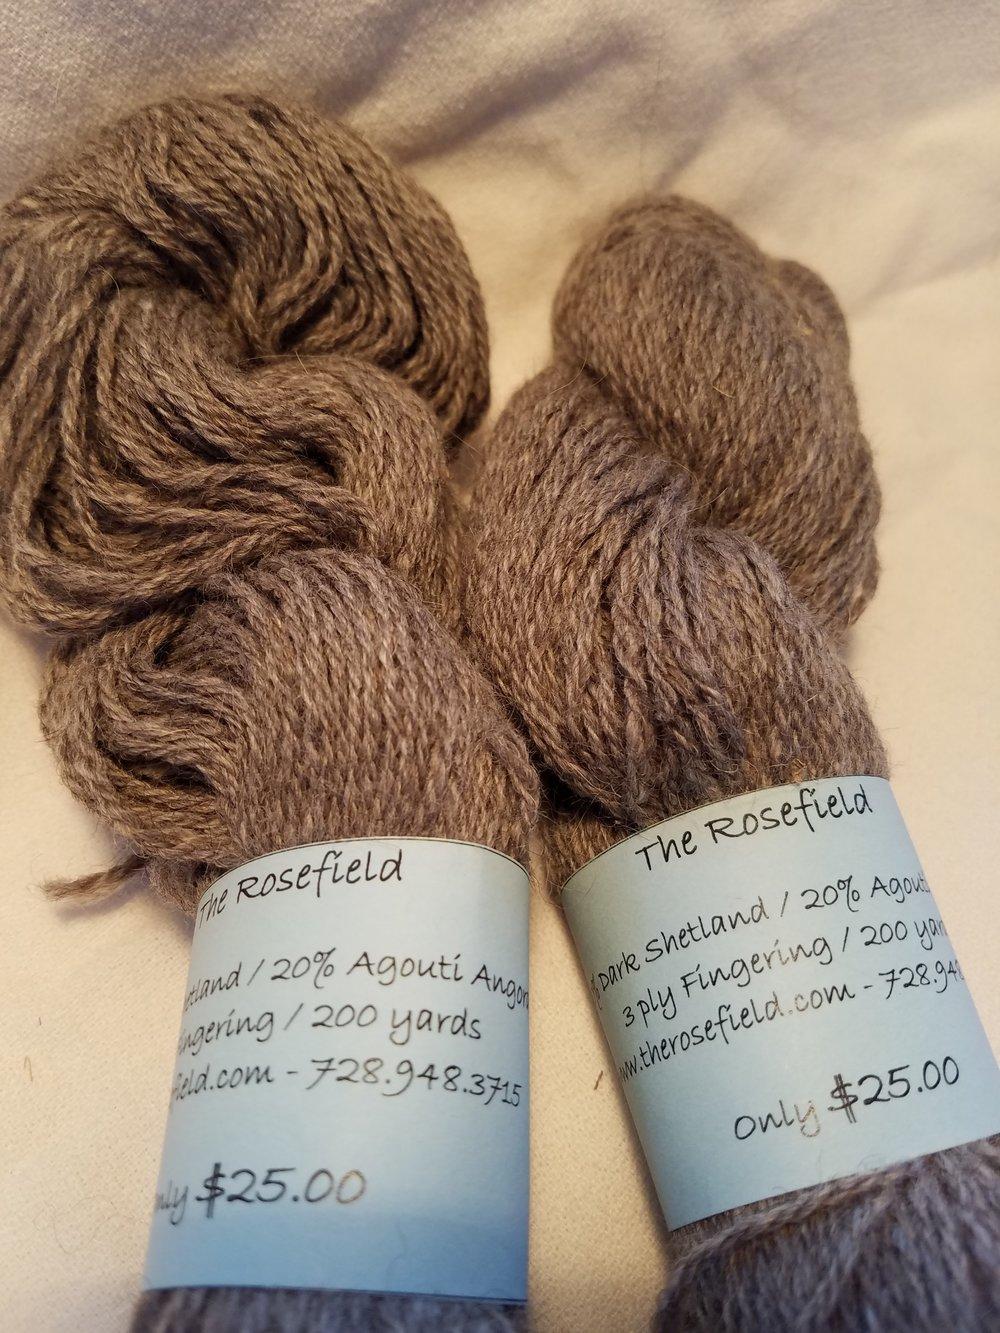 10. Dk Shetland/Agouti Angora 3 ply fingering